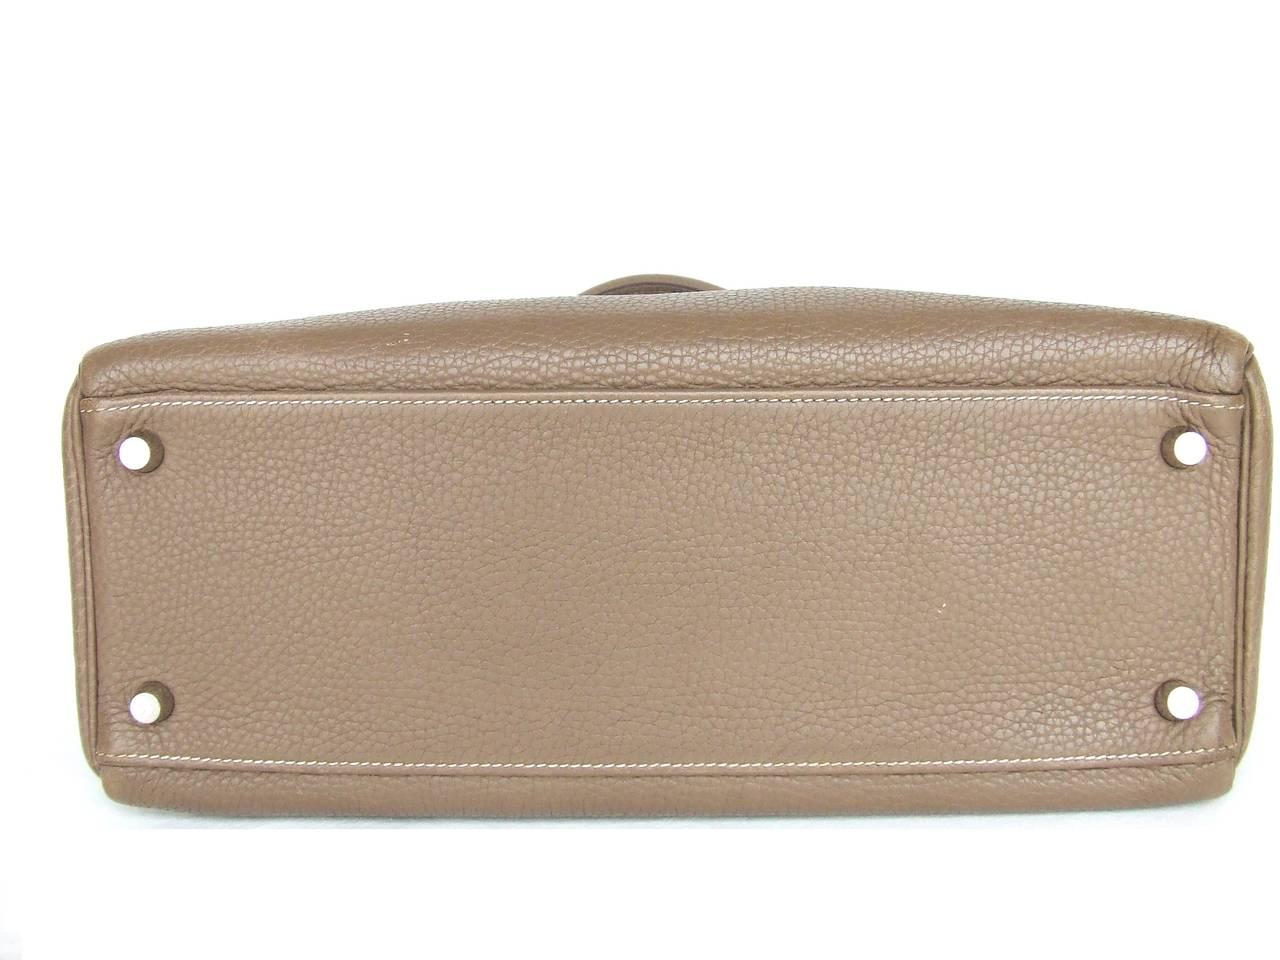 hermes crocodile birkin bag replica - Authentic Hermes Kelly 32 Bag Etoupe Togo Leather Silver Hardware ...